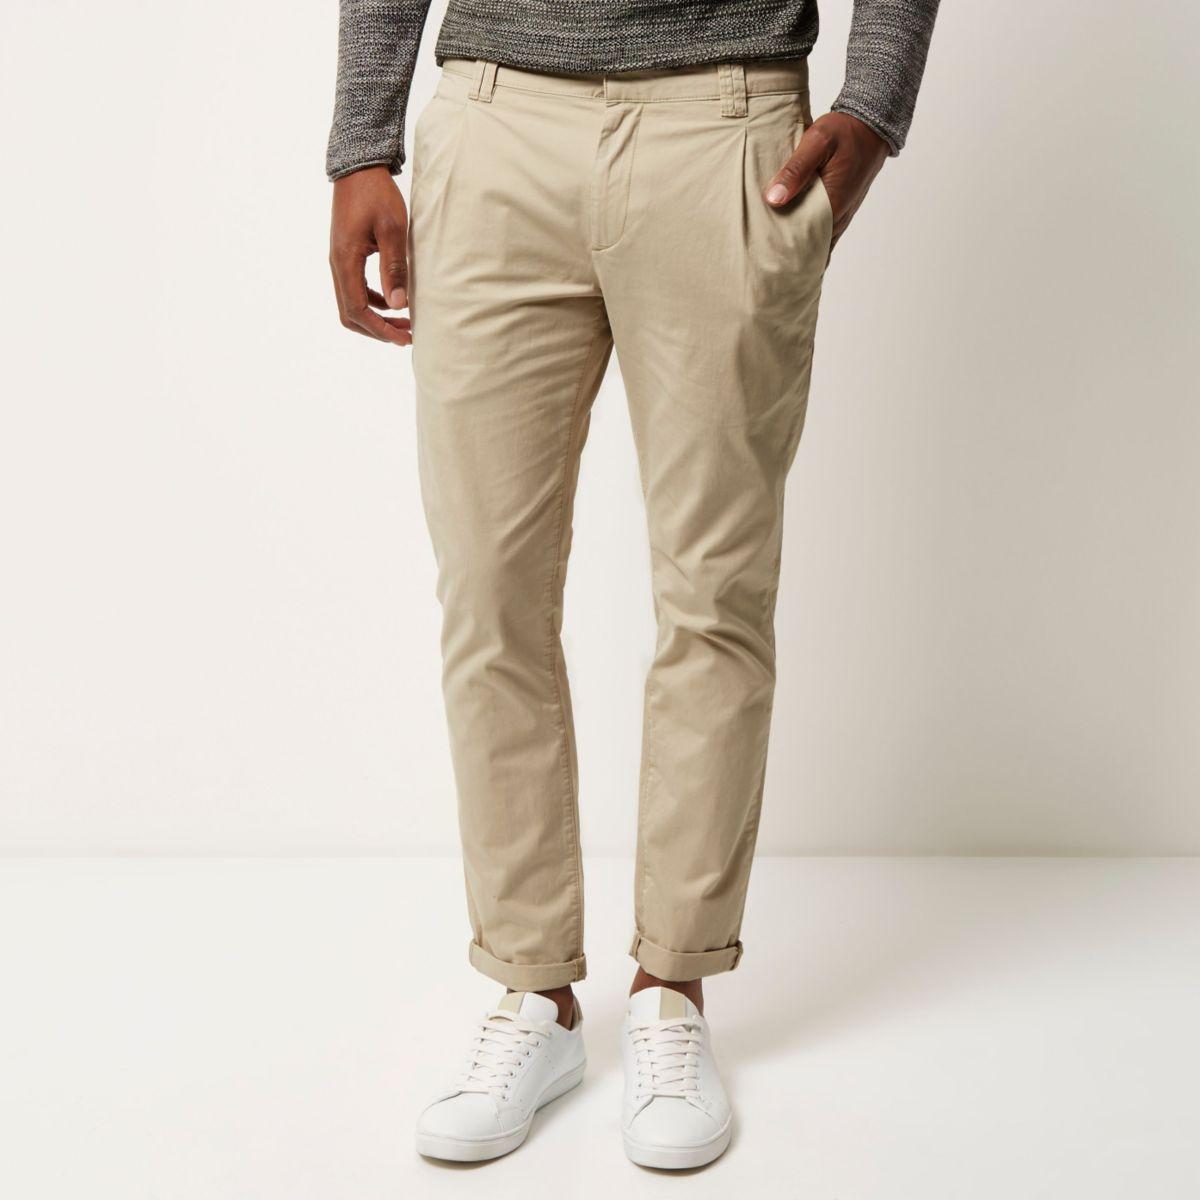 Light brown slim pleated pants